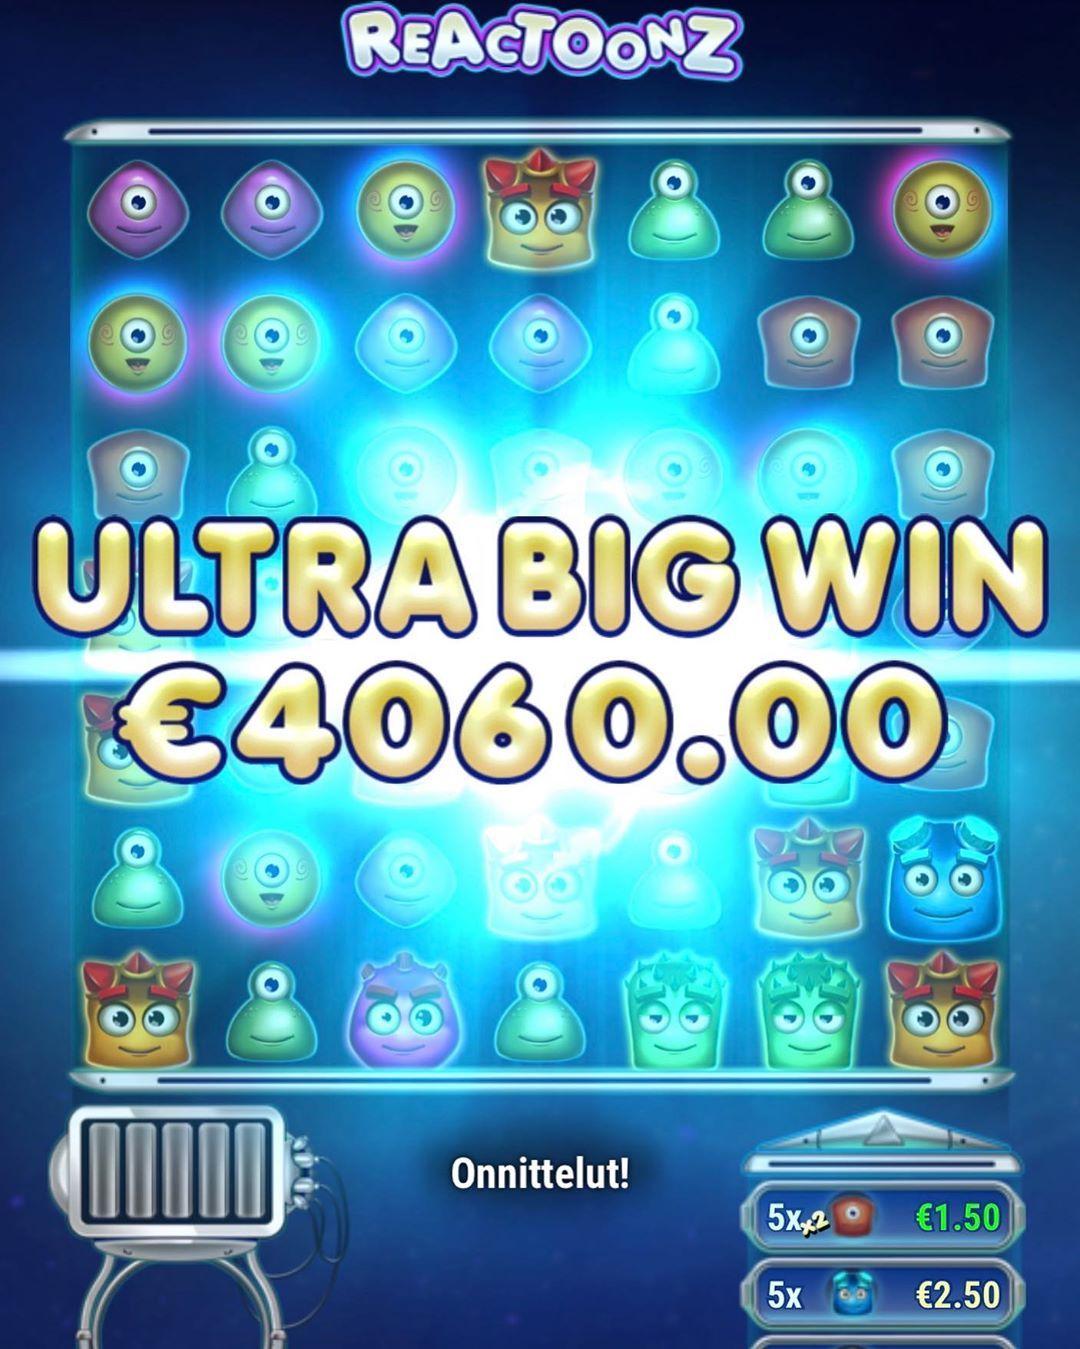 coinmaster Reactoons win!! casino